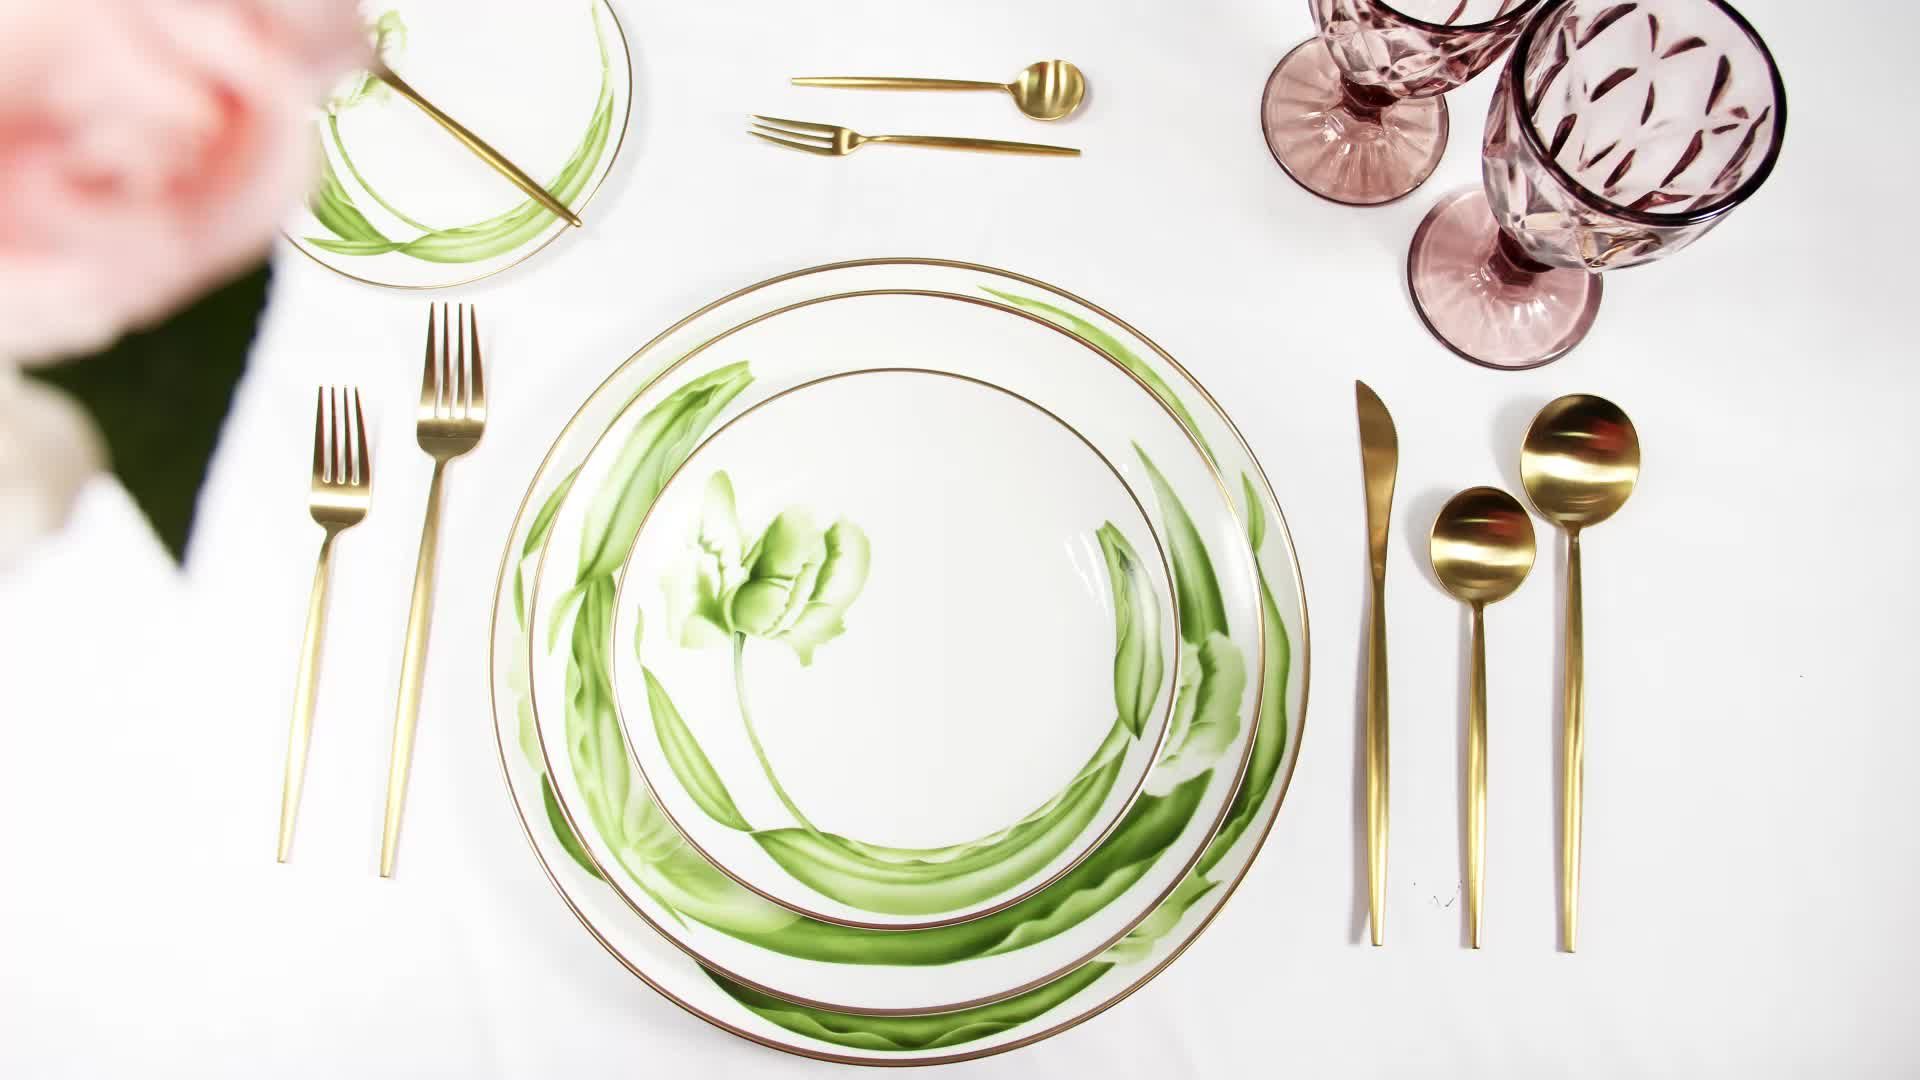 Grosir Mewah Rusia Kerang Tropis Tuscan Valentine Putih Dinner Ware Porselen Tulang Cina Makan Set